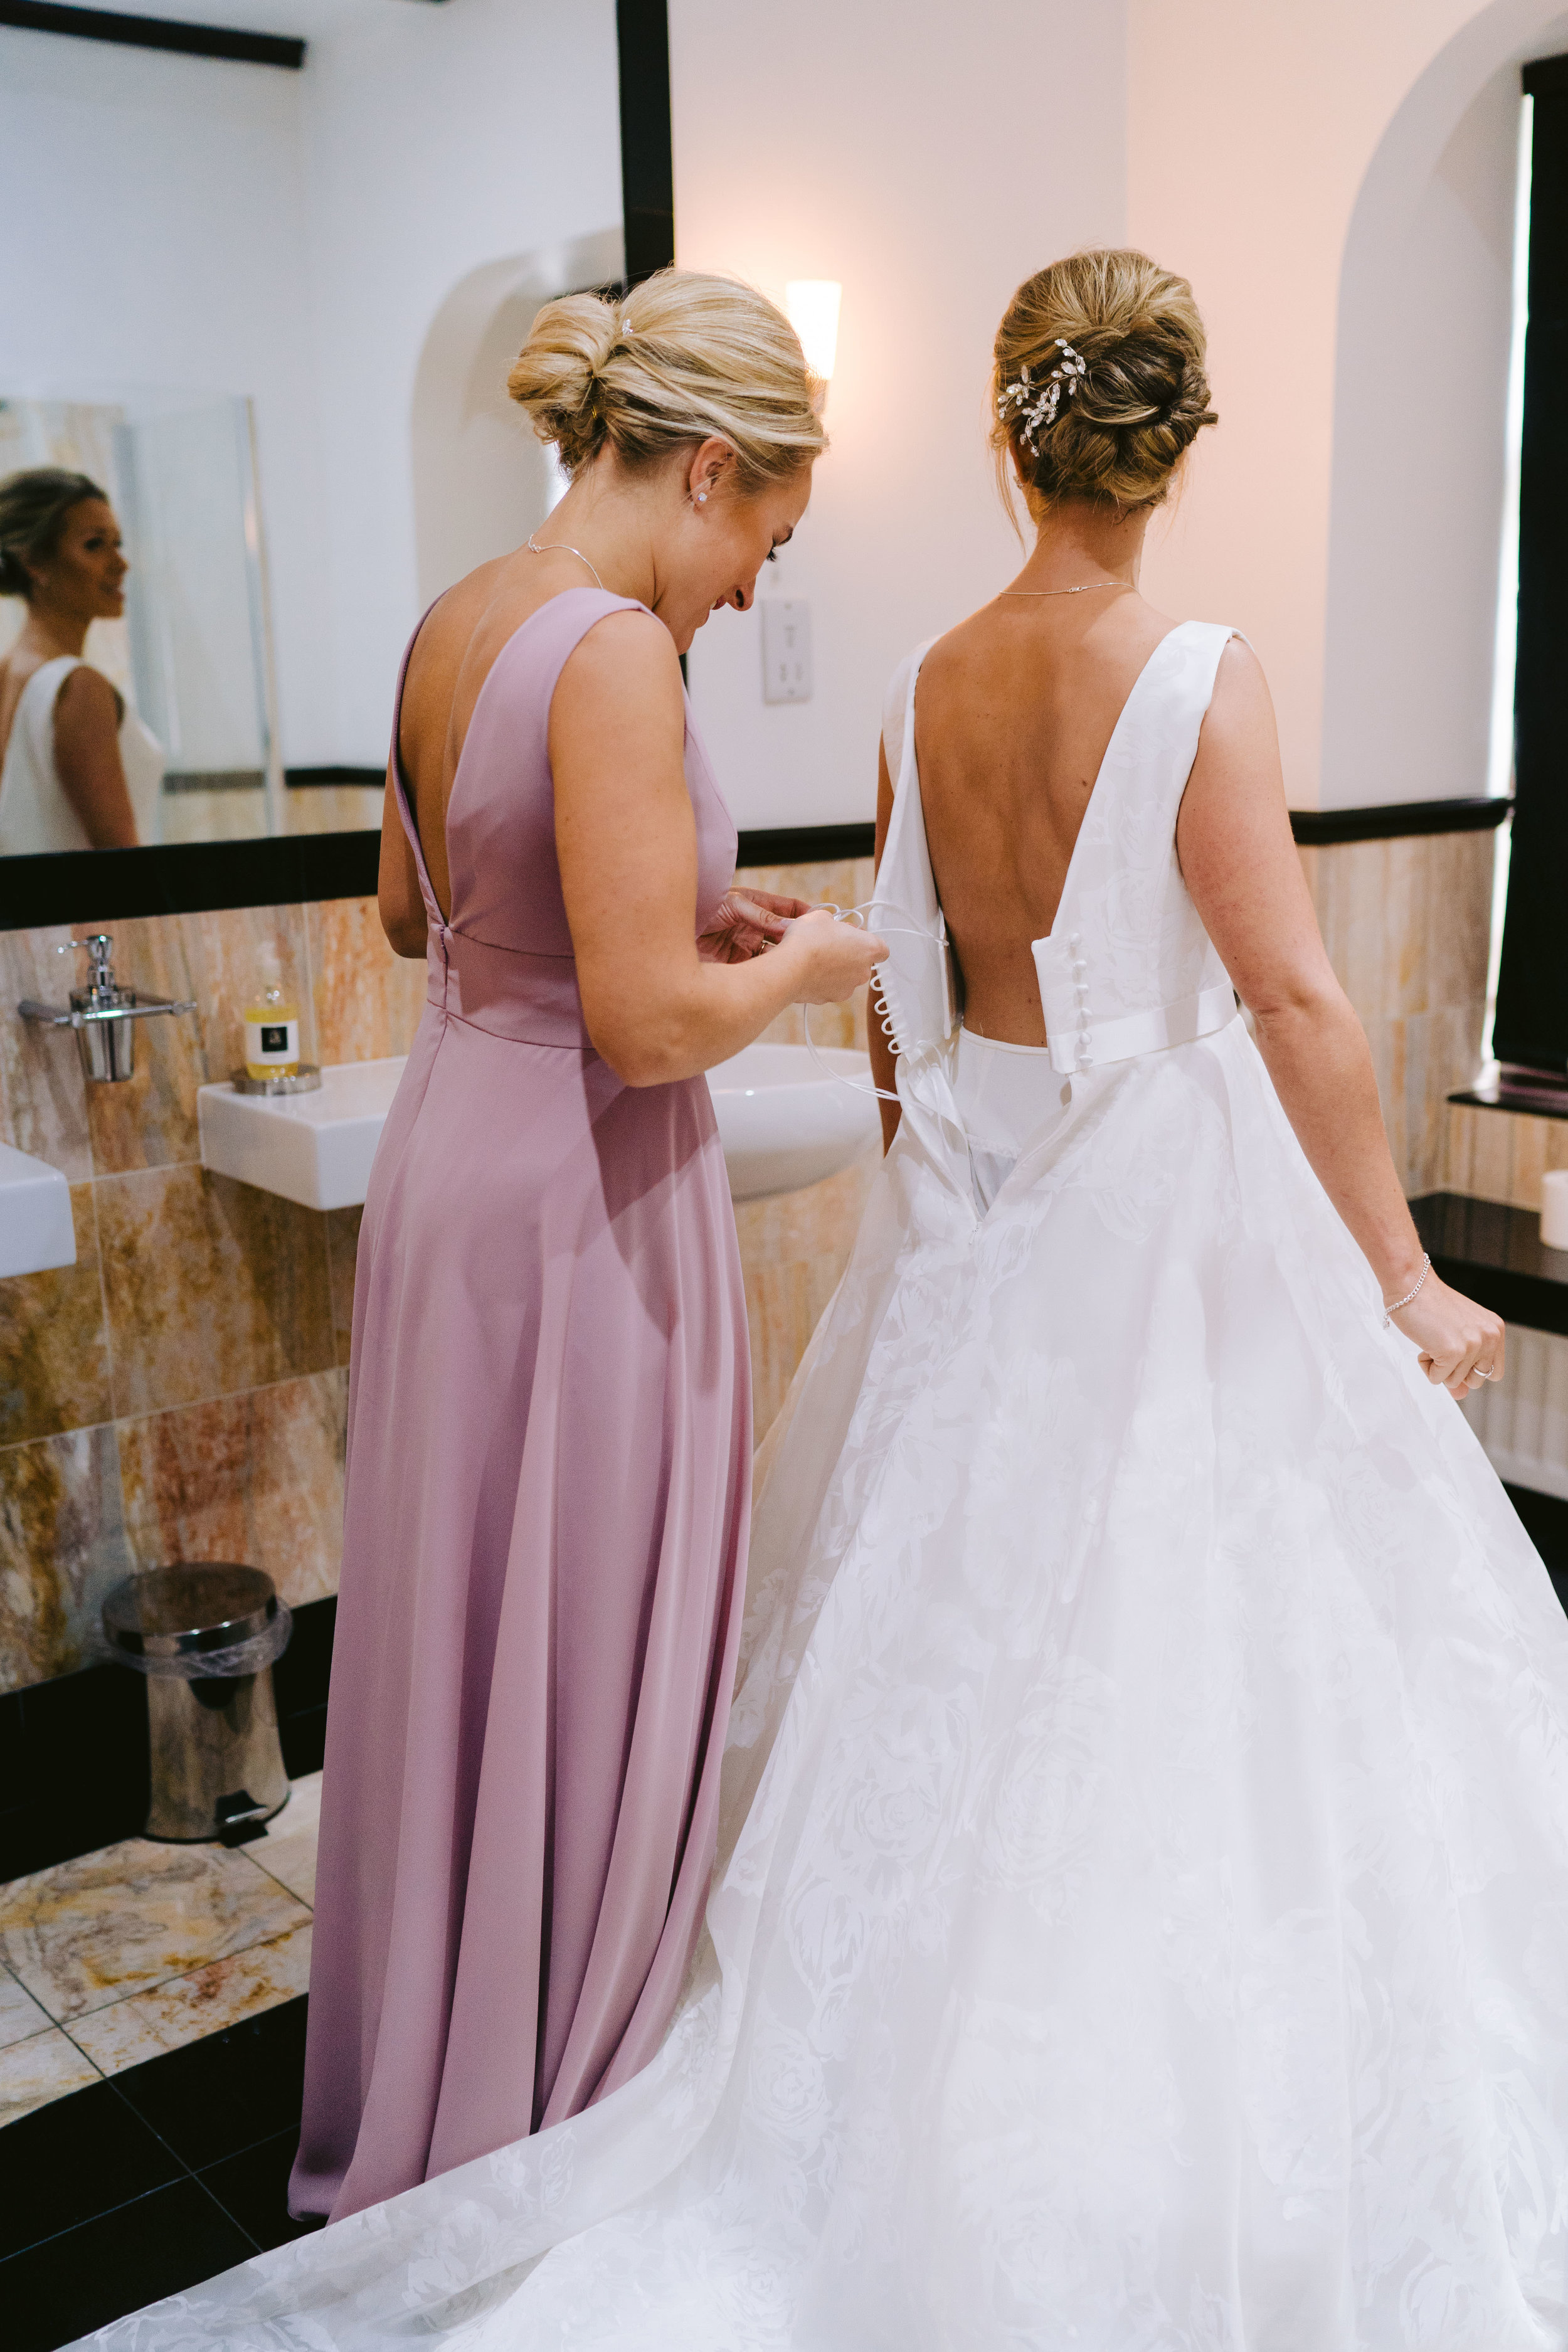 Karin_and_Shauns_Wedding_-_Achnagairn_Castle_-_www.eilidhrobertson.co.uk-213.jpg